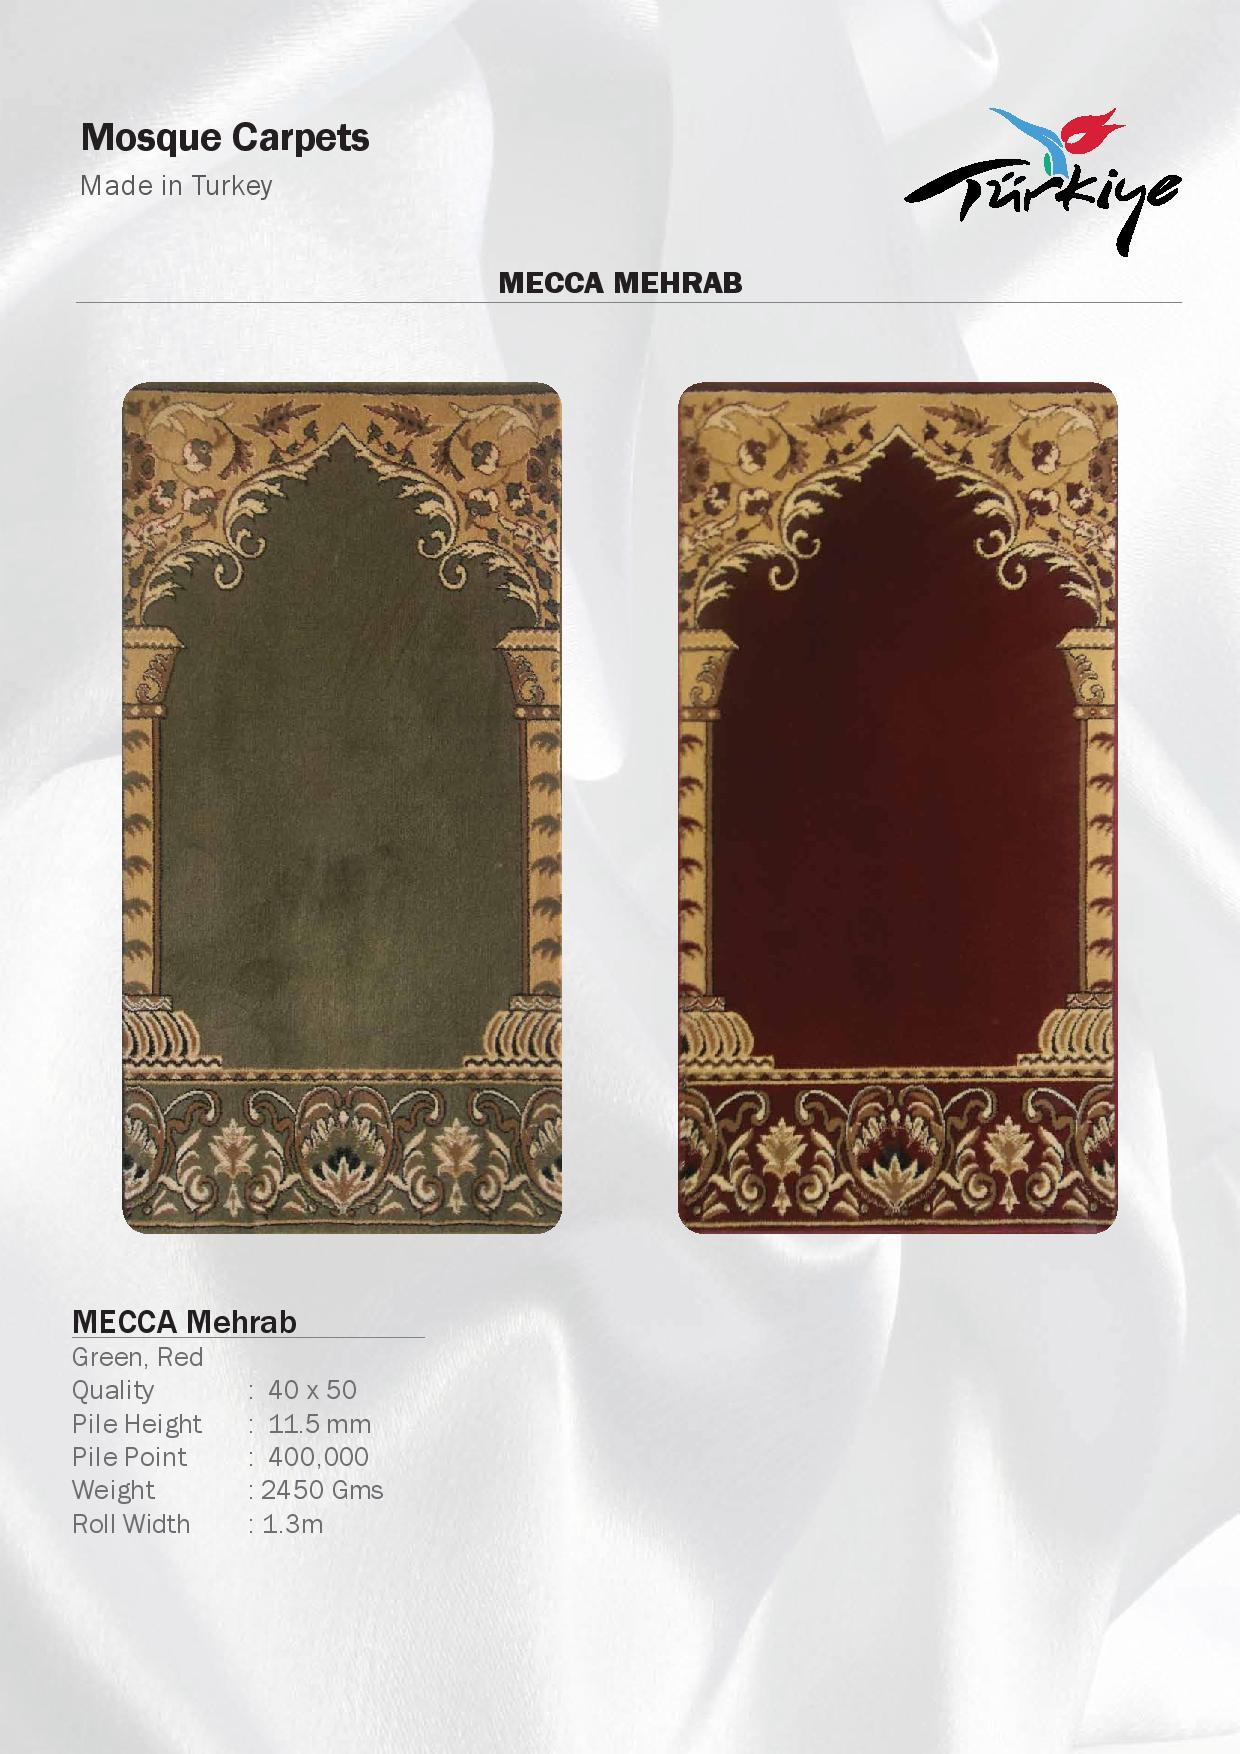 Mosque-Carpets-Mecca-Mehrab